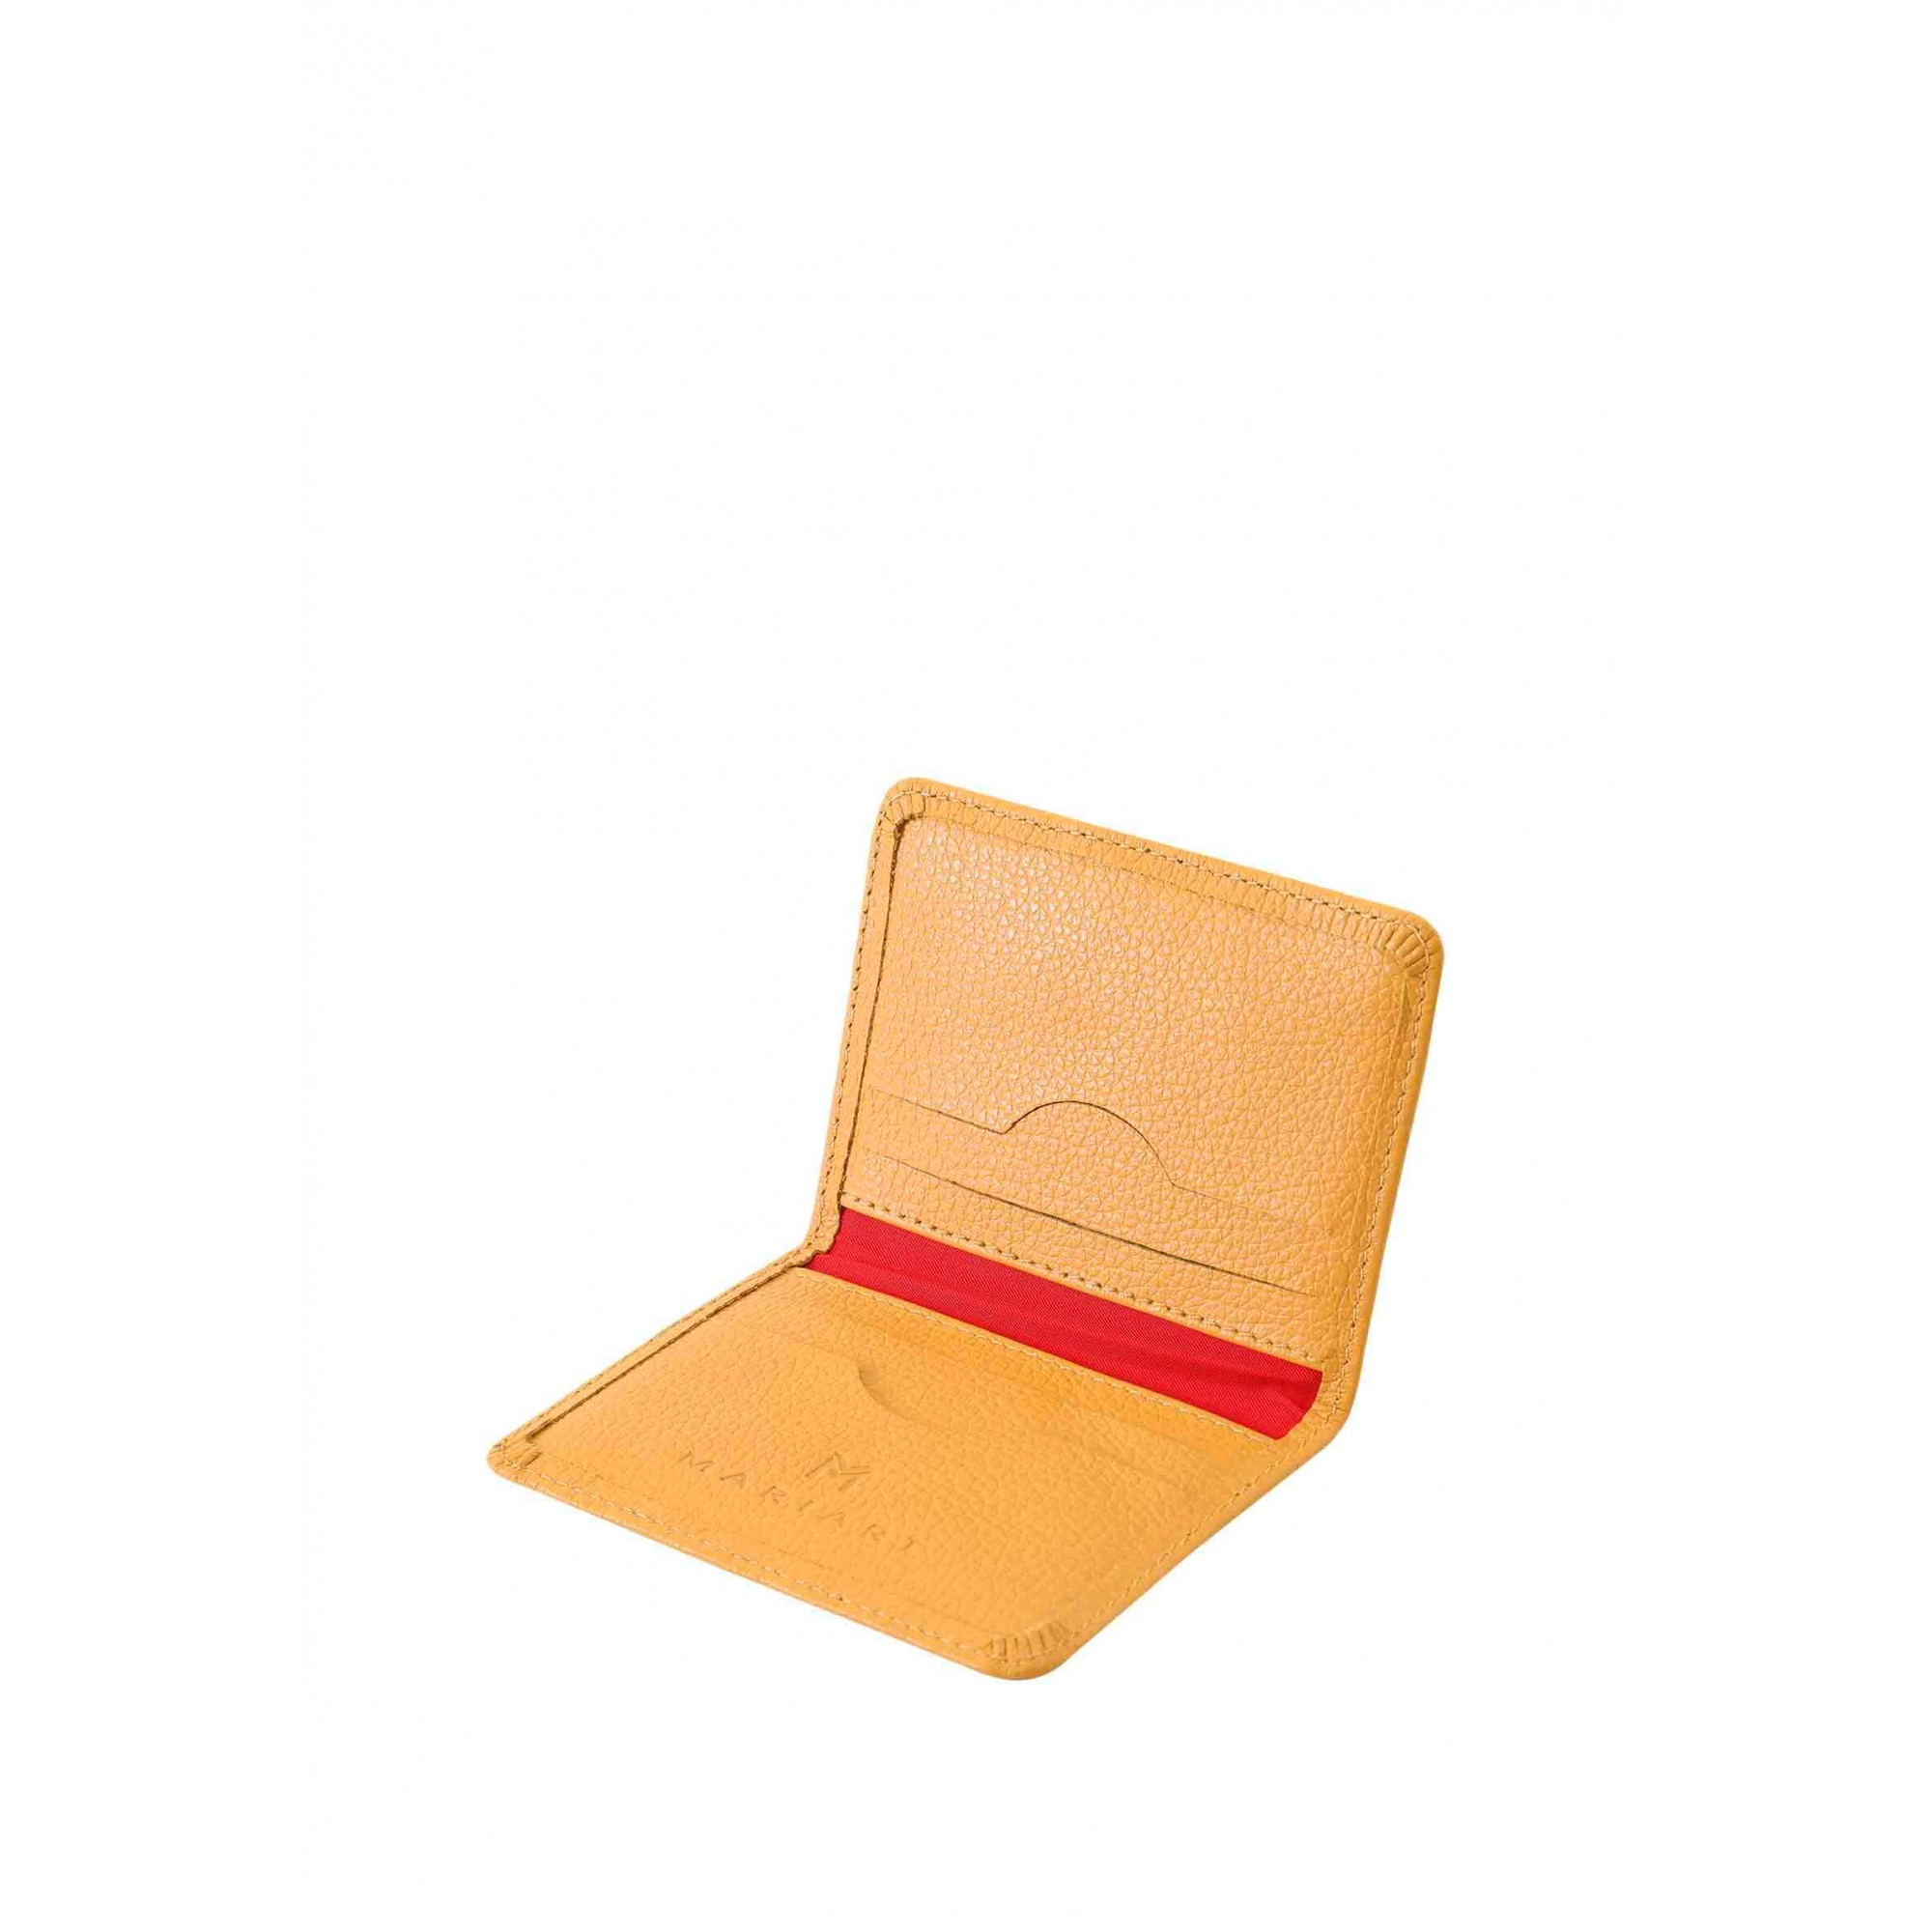 Carteira Couro Mariart 554C CORES Gold